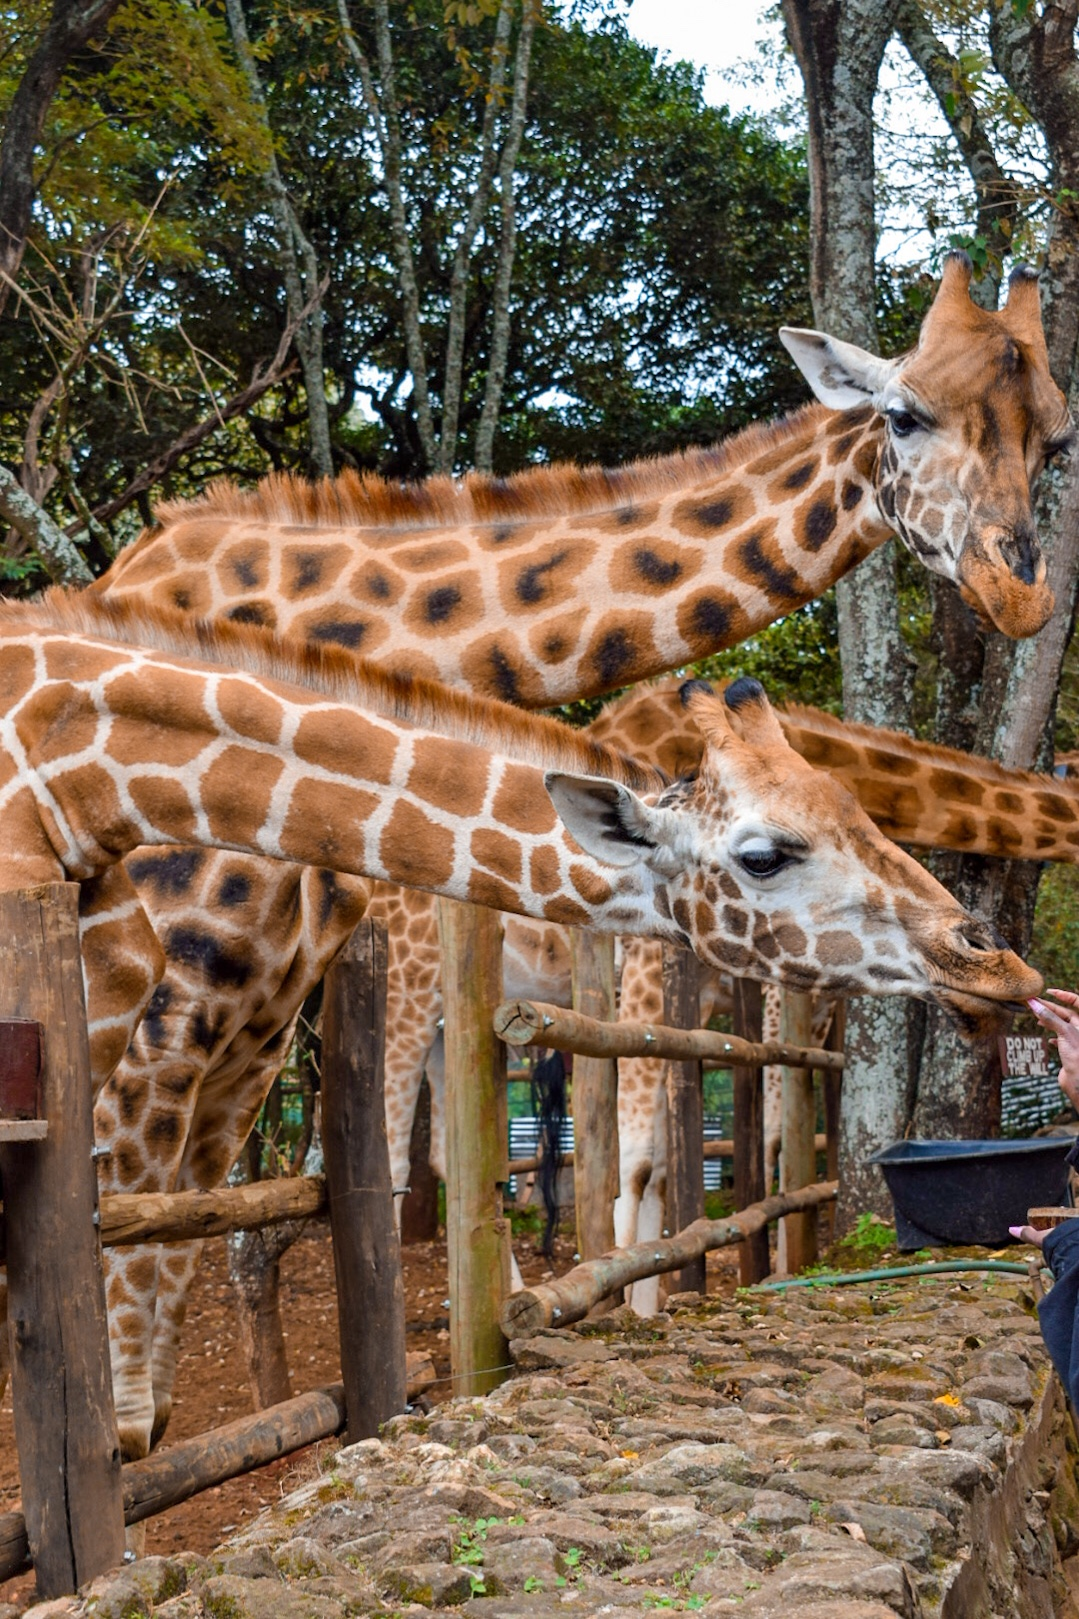 Giraffes at the lower deck of the Giraffe Centre